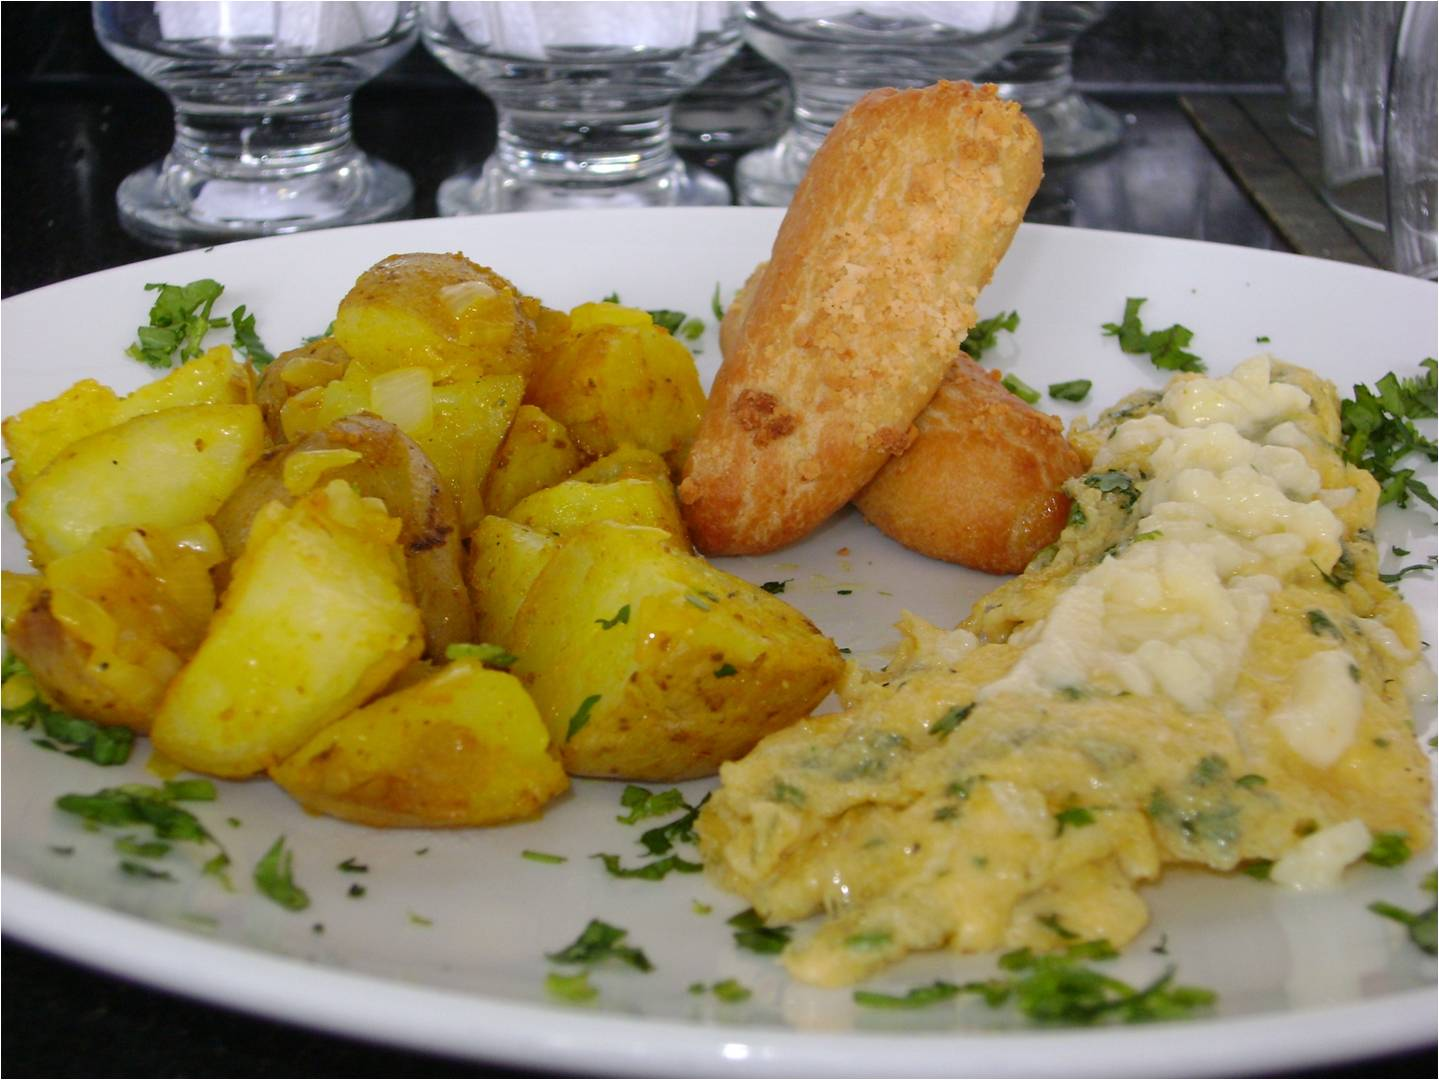 Cursos cortos en obra culinaria obra culinaria for Cocina mediterranea